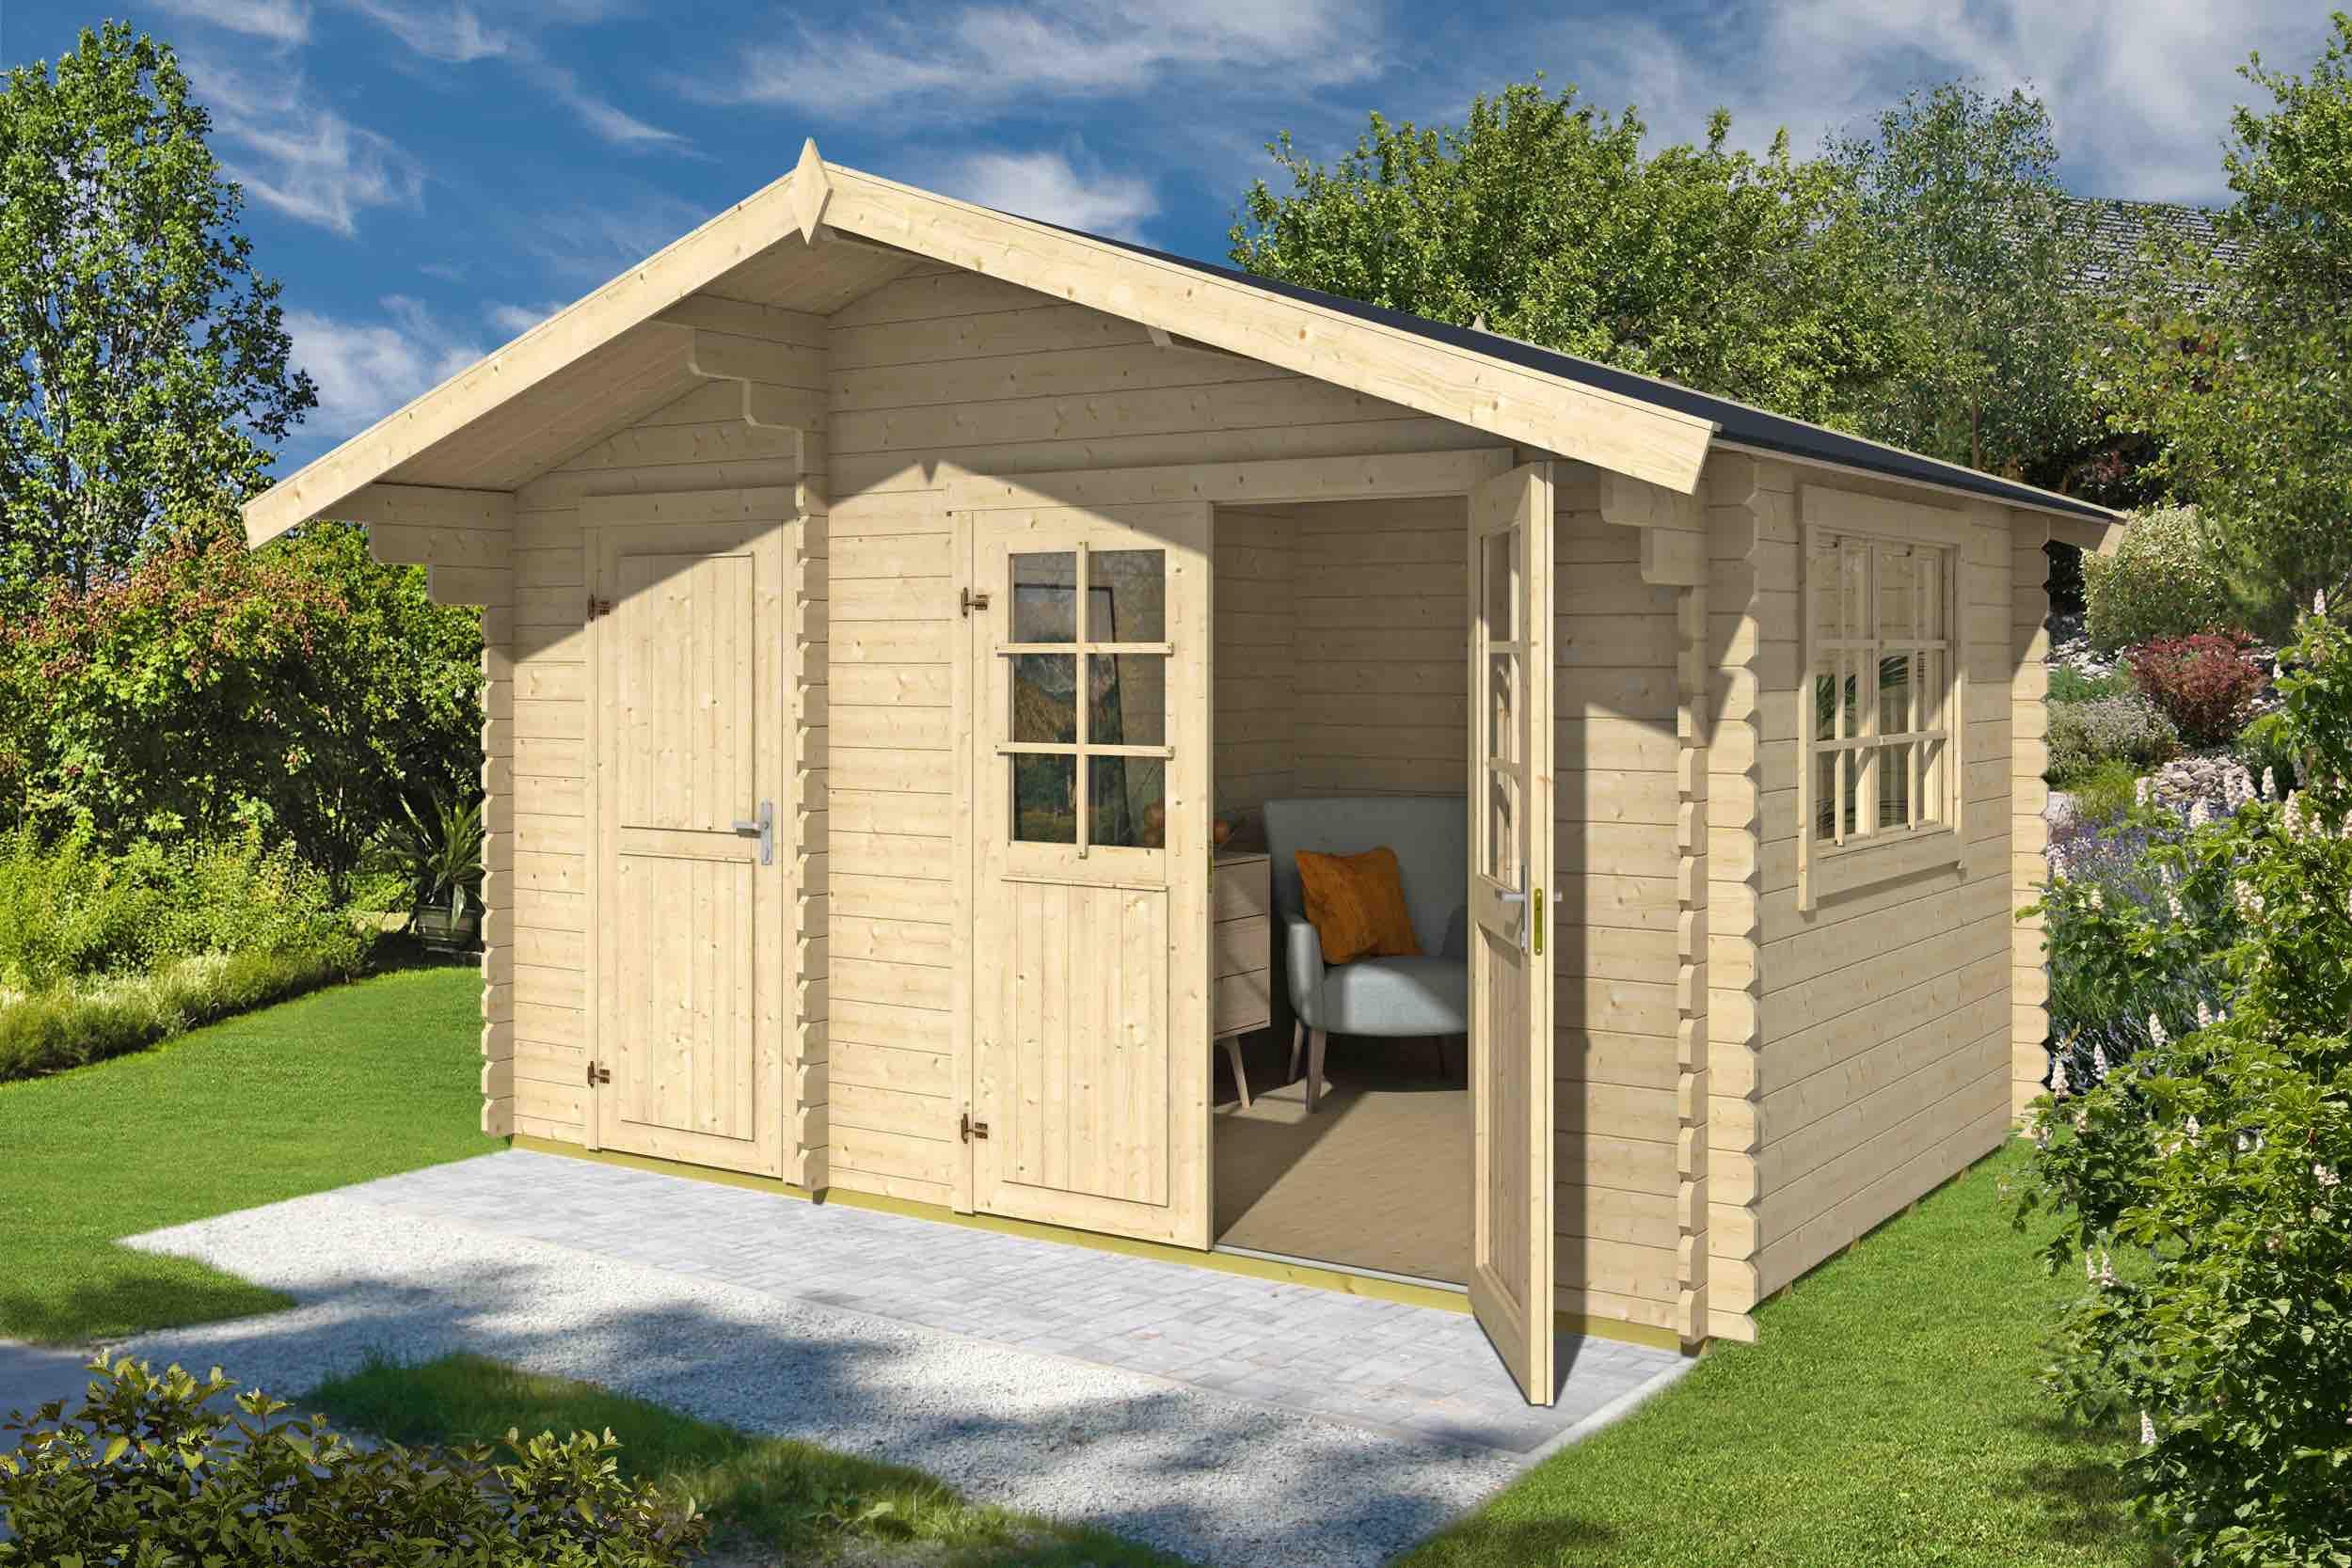 gartenhaus aktion 27 28 mm ca 400x270 cm holzwurm obersayn. Black Bedroom Furniture Sets. Home Design Ideas